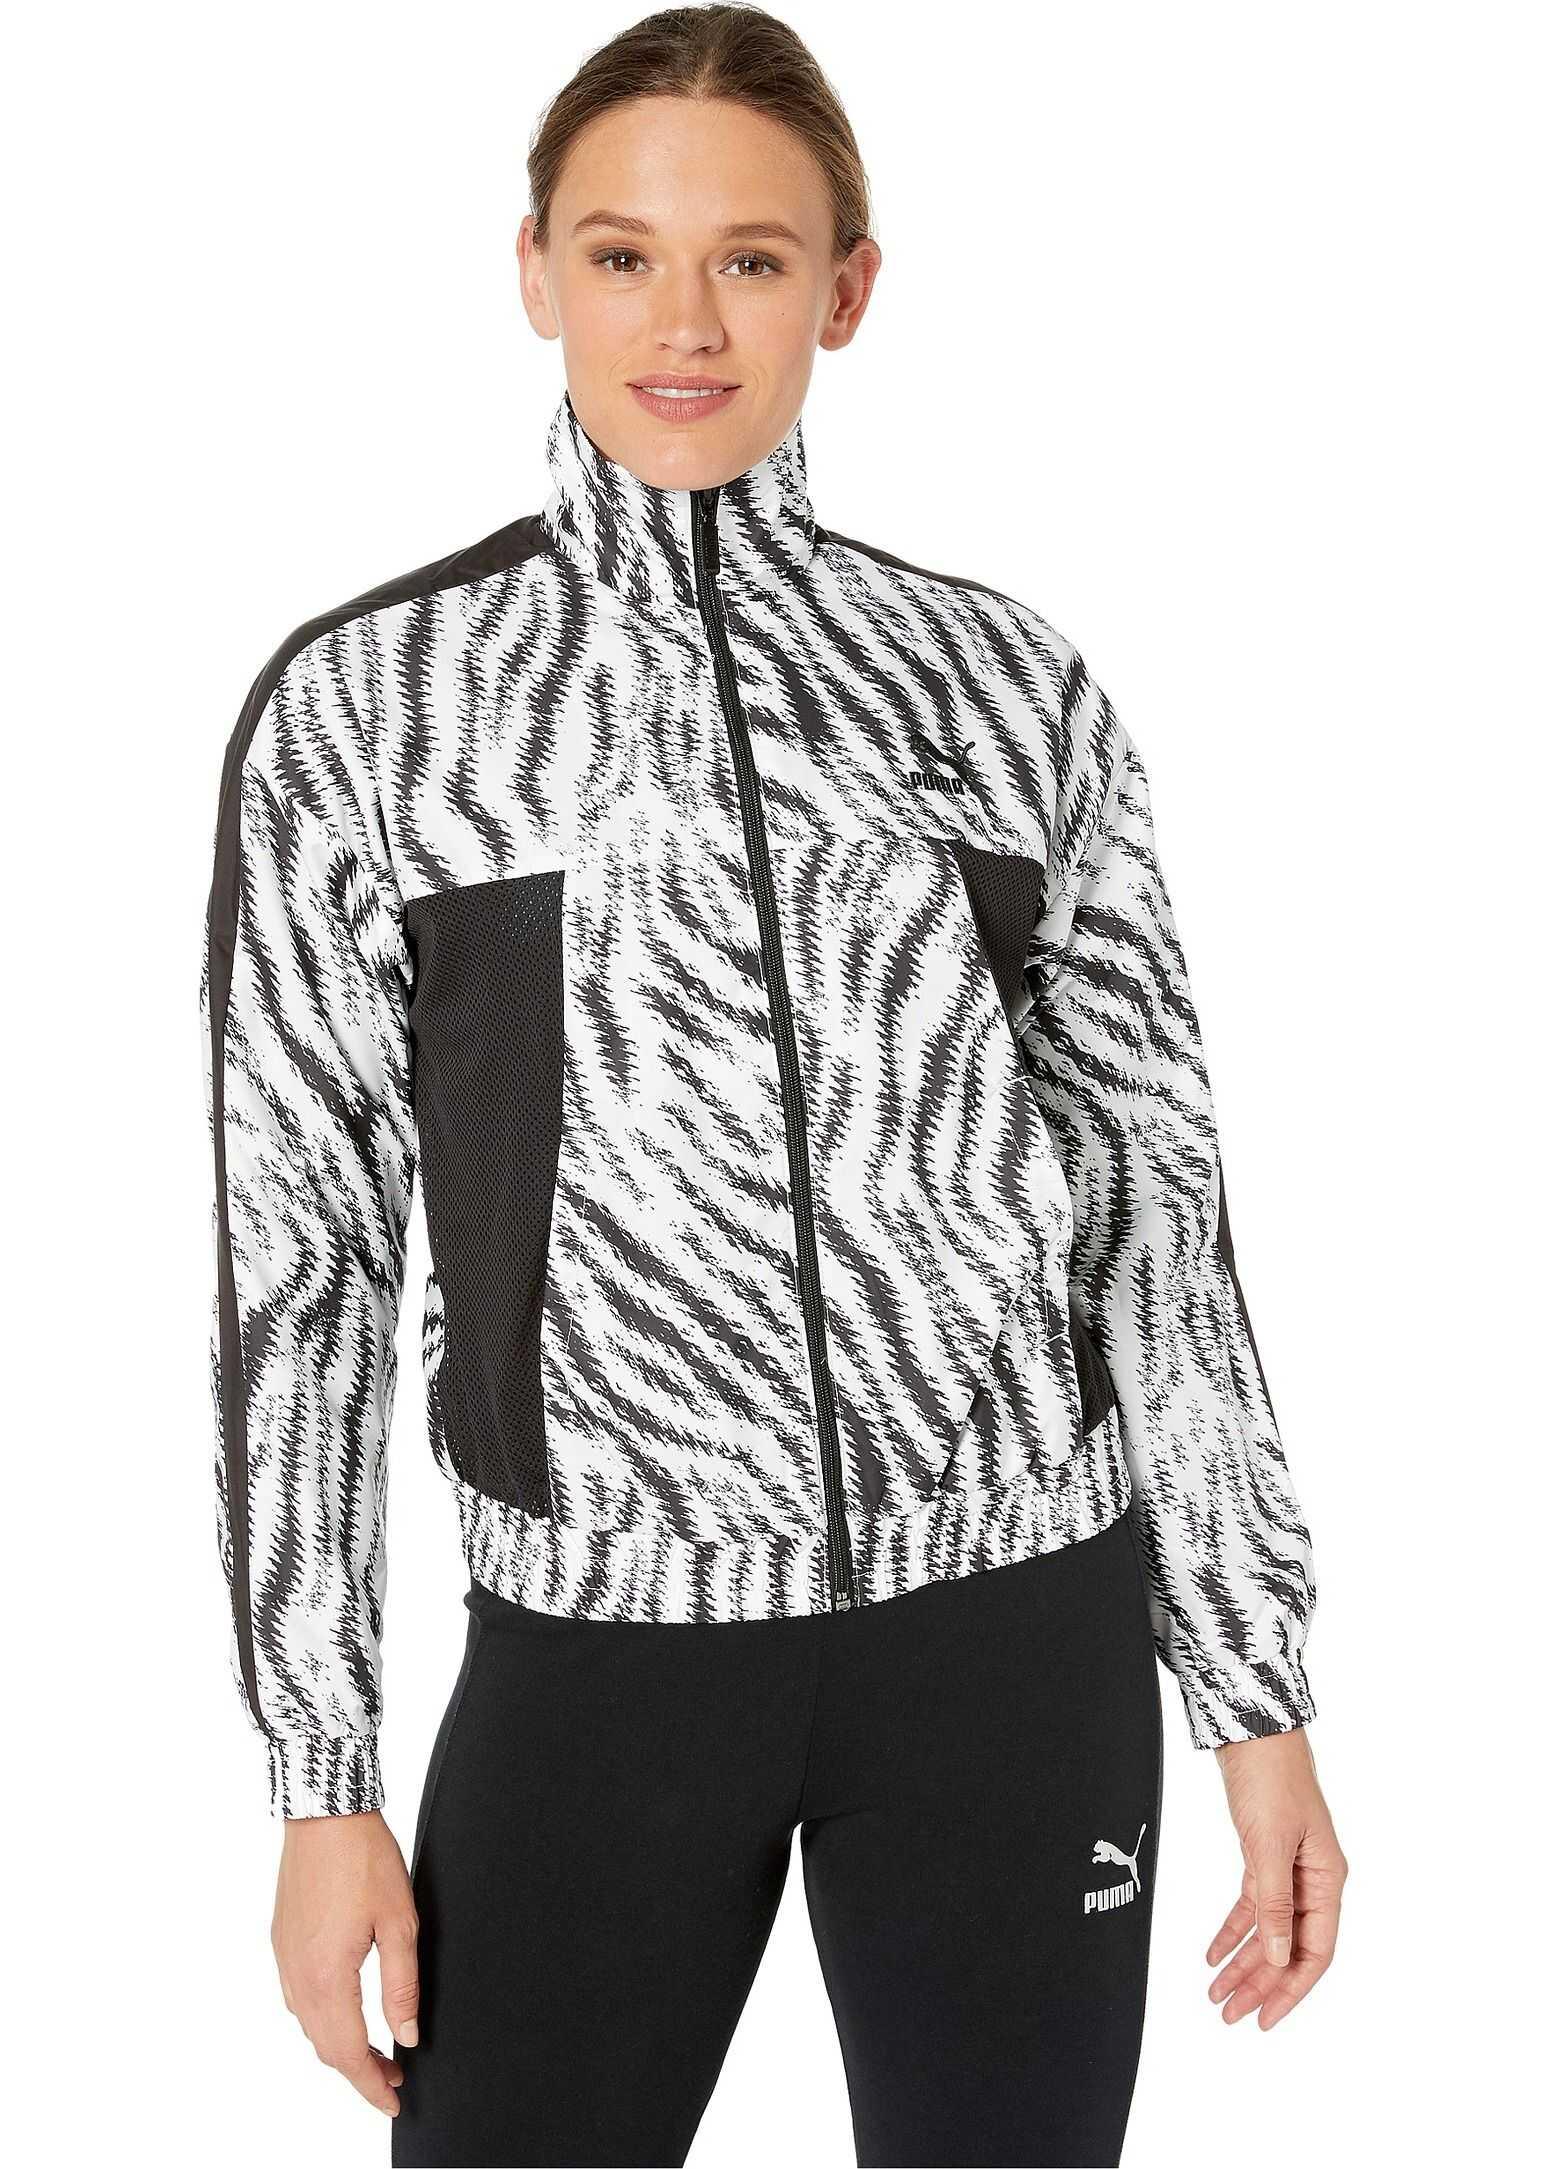 PUMA Wild Pack Cropped Jacket Puma White/Zebra